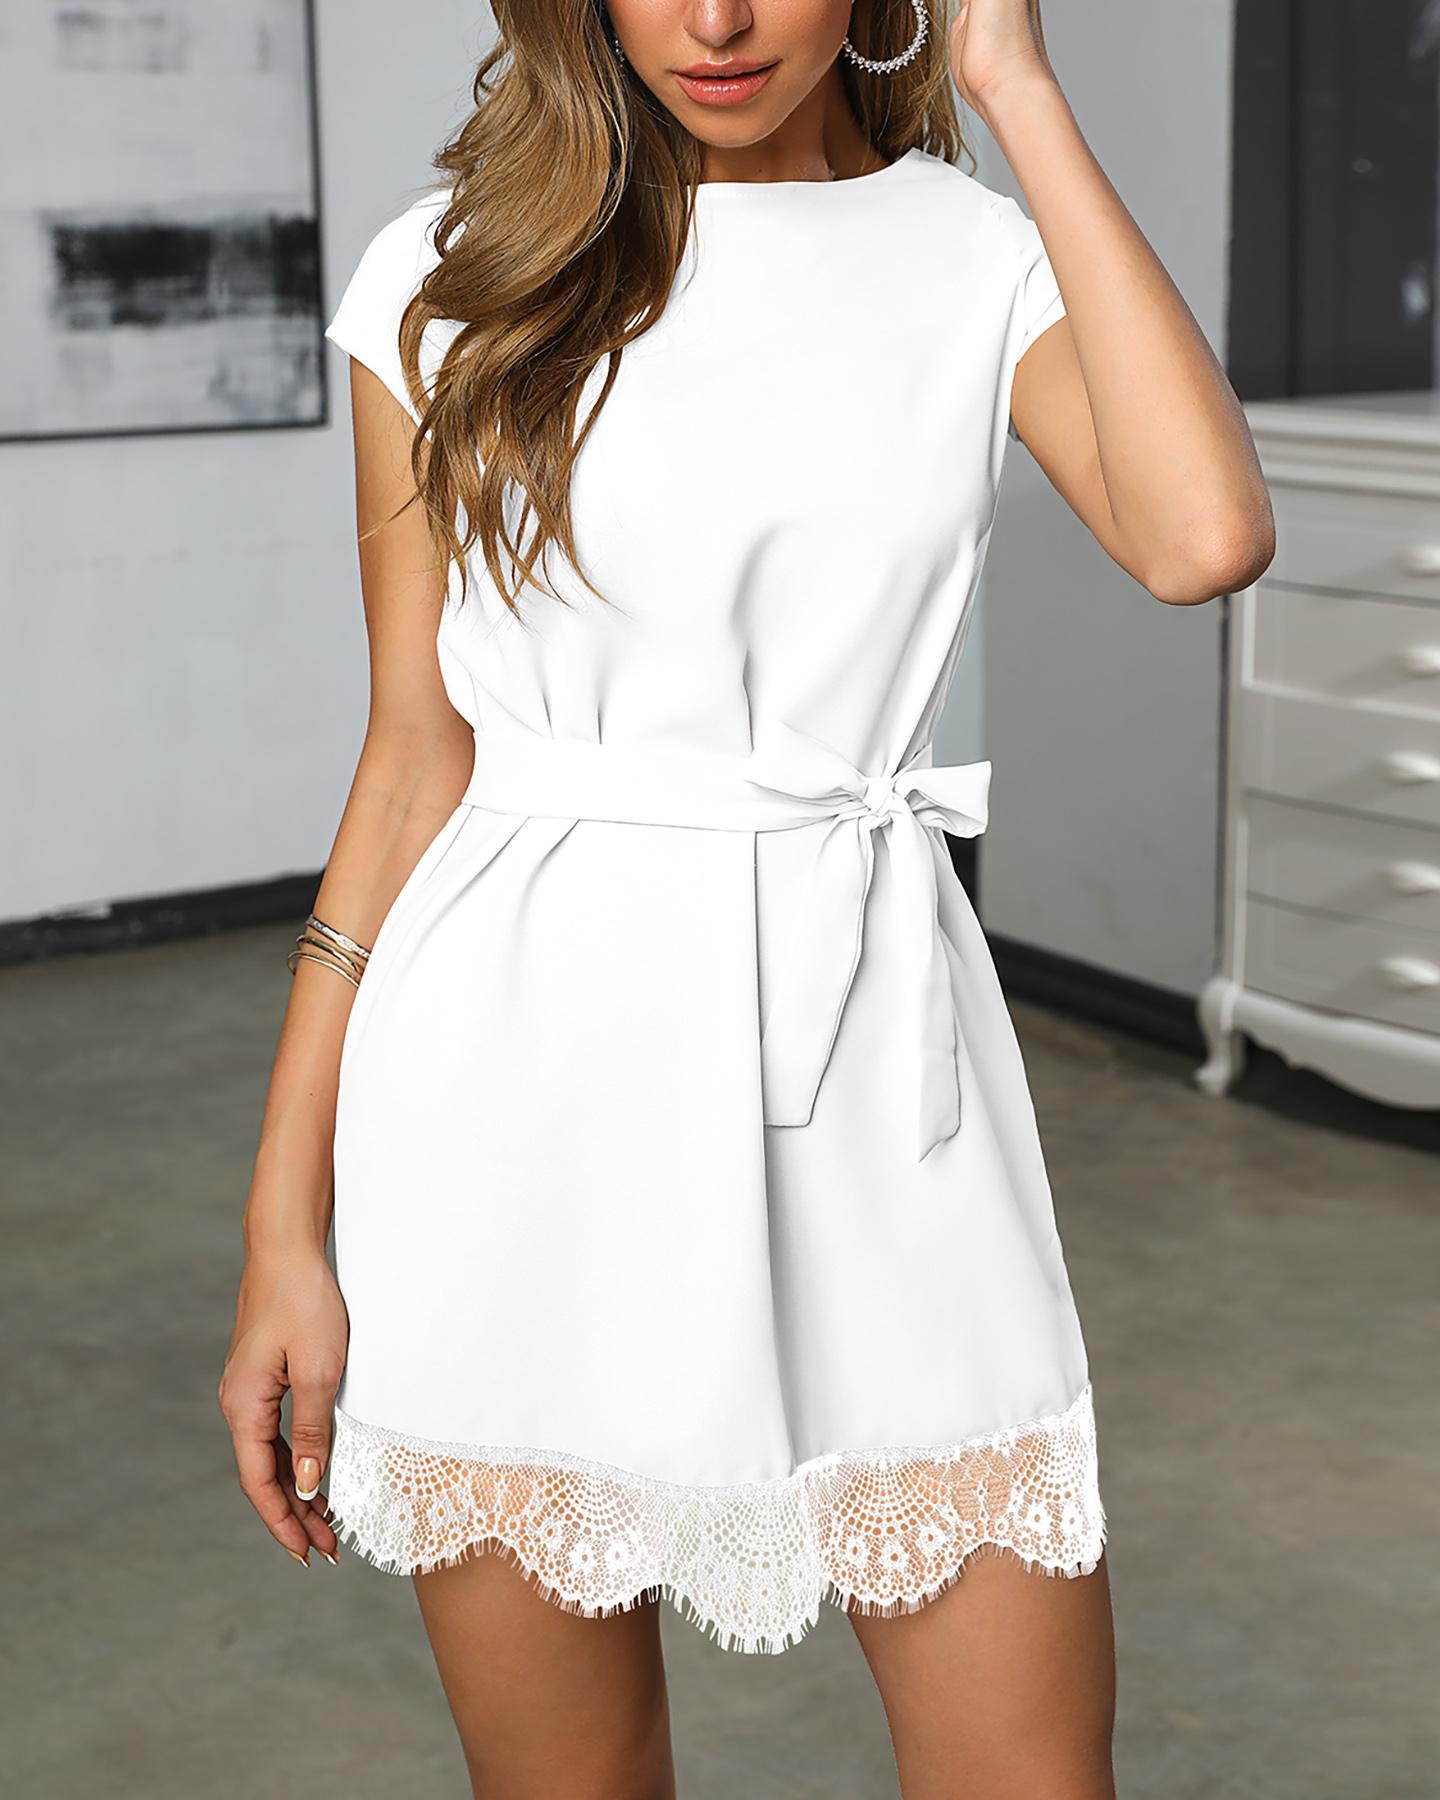 Short Sleeve Eyelash Lace Hem Casual Dress от ChicMe WW